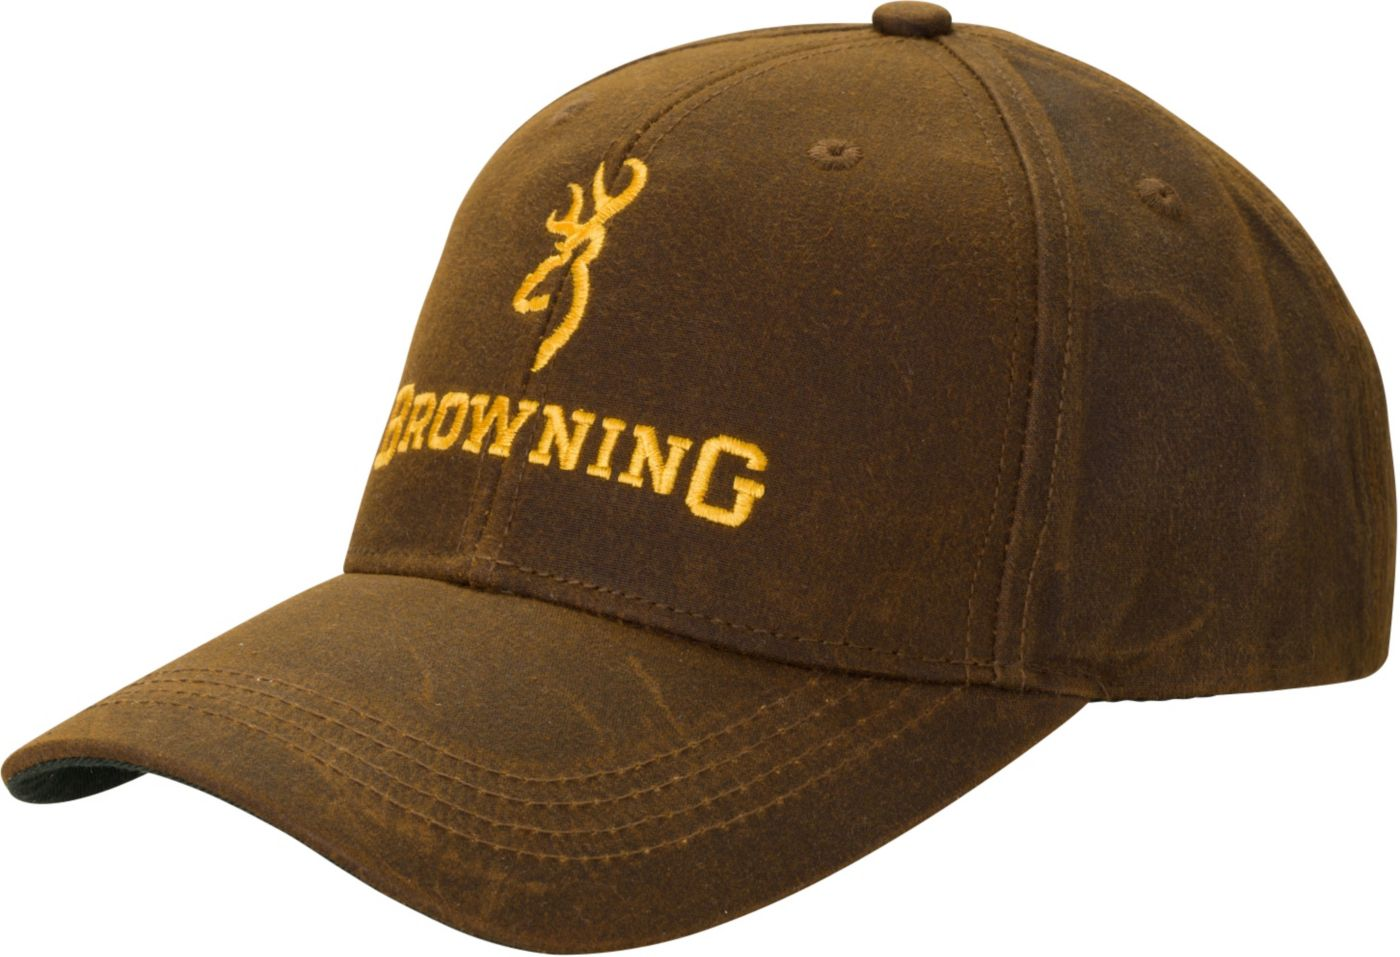 Browning Men's Dura-Wax Hunting Hat